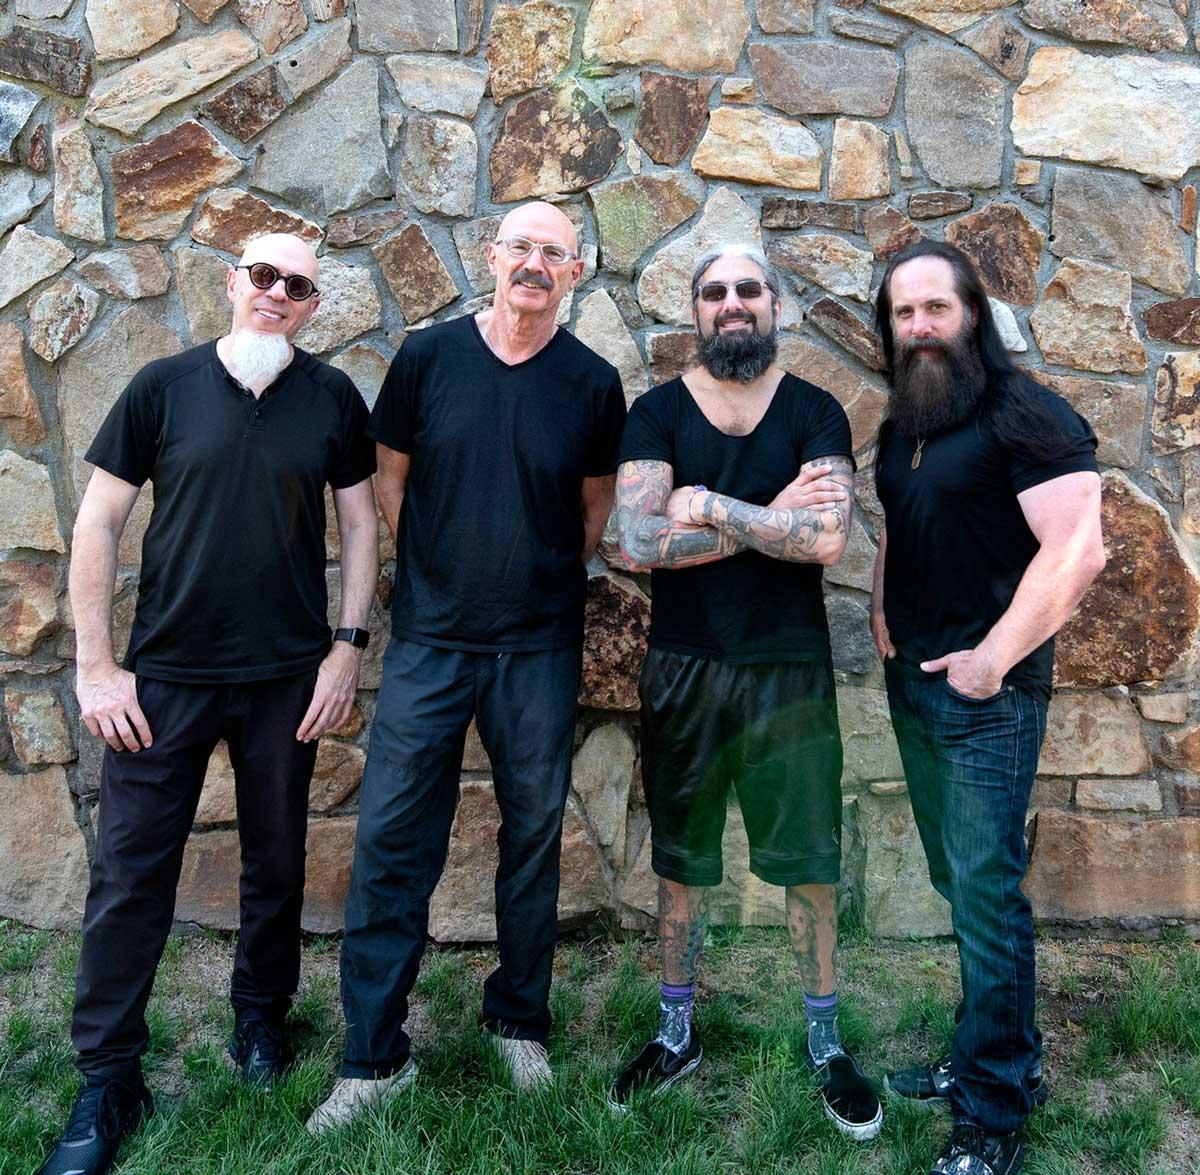 Liquid Tension Experiment / New album ready after 22 year hiatus | MetalTalk